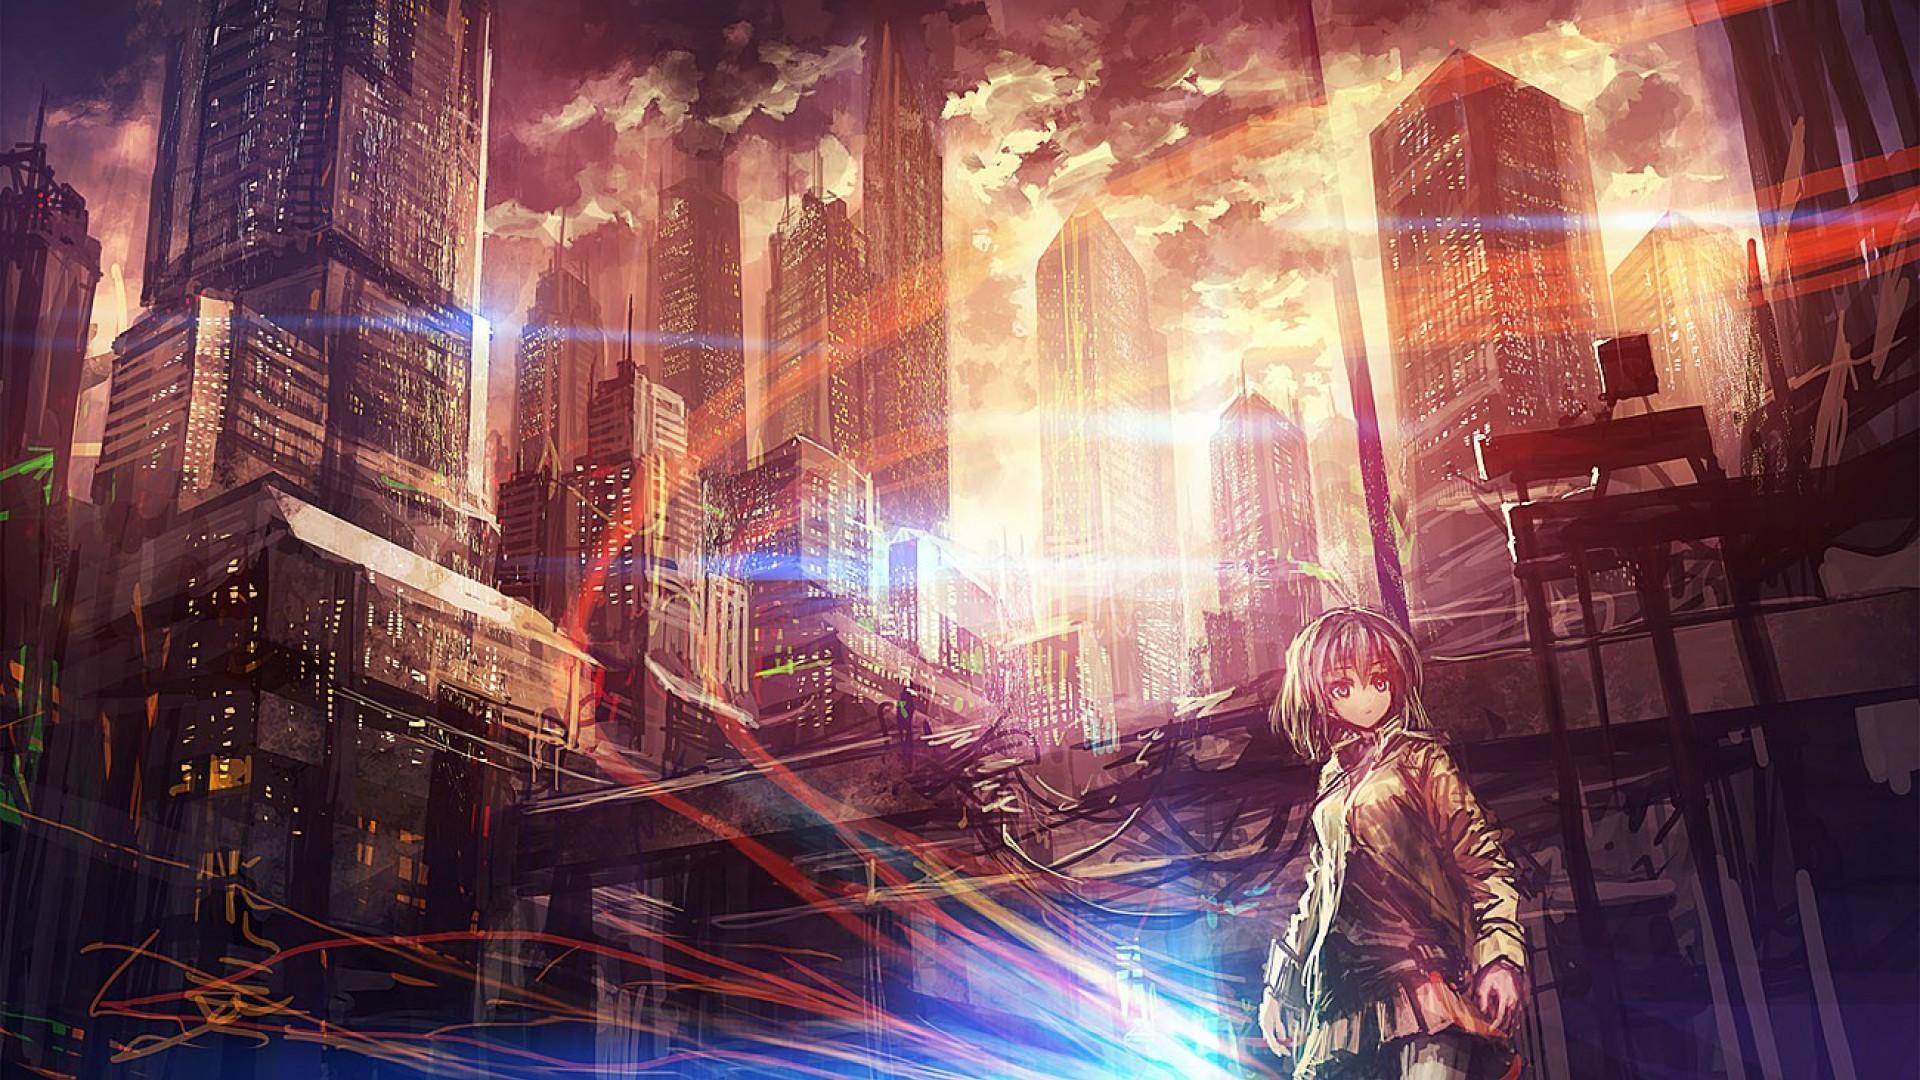 Dark-Anime-Scenery-Desktop-Wallpapers